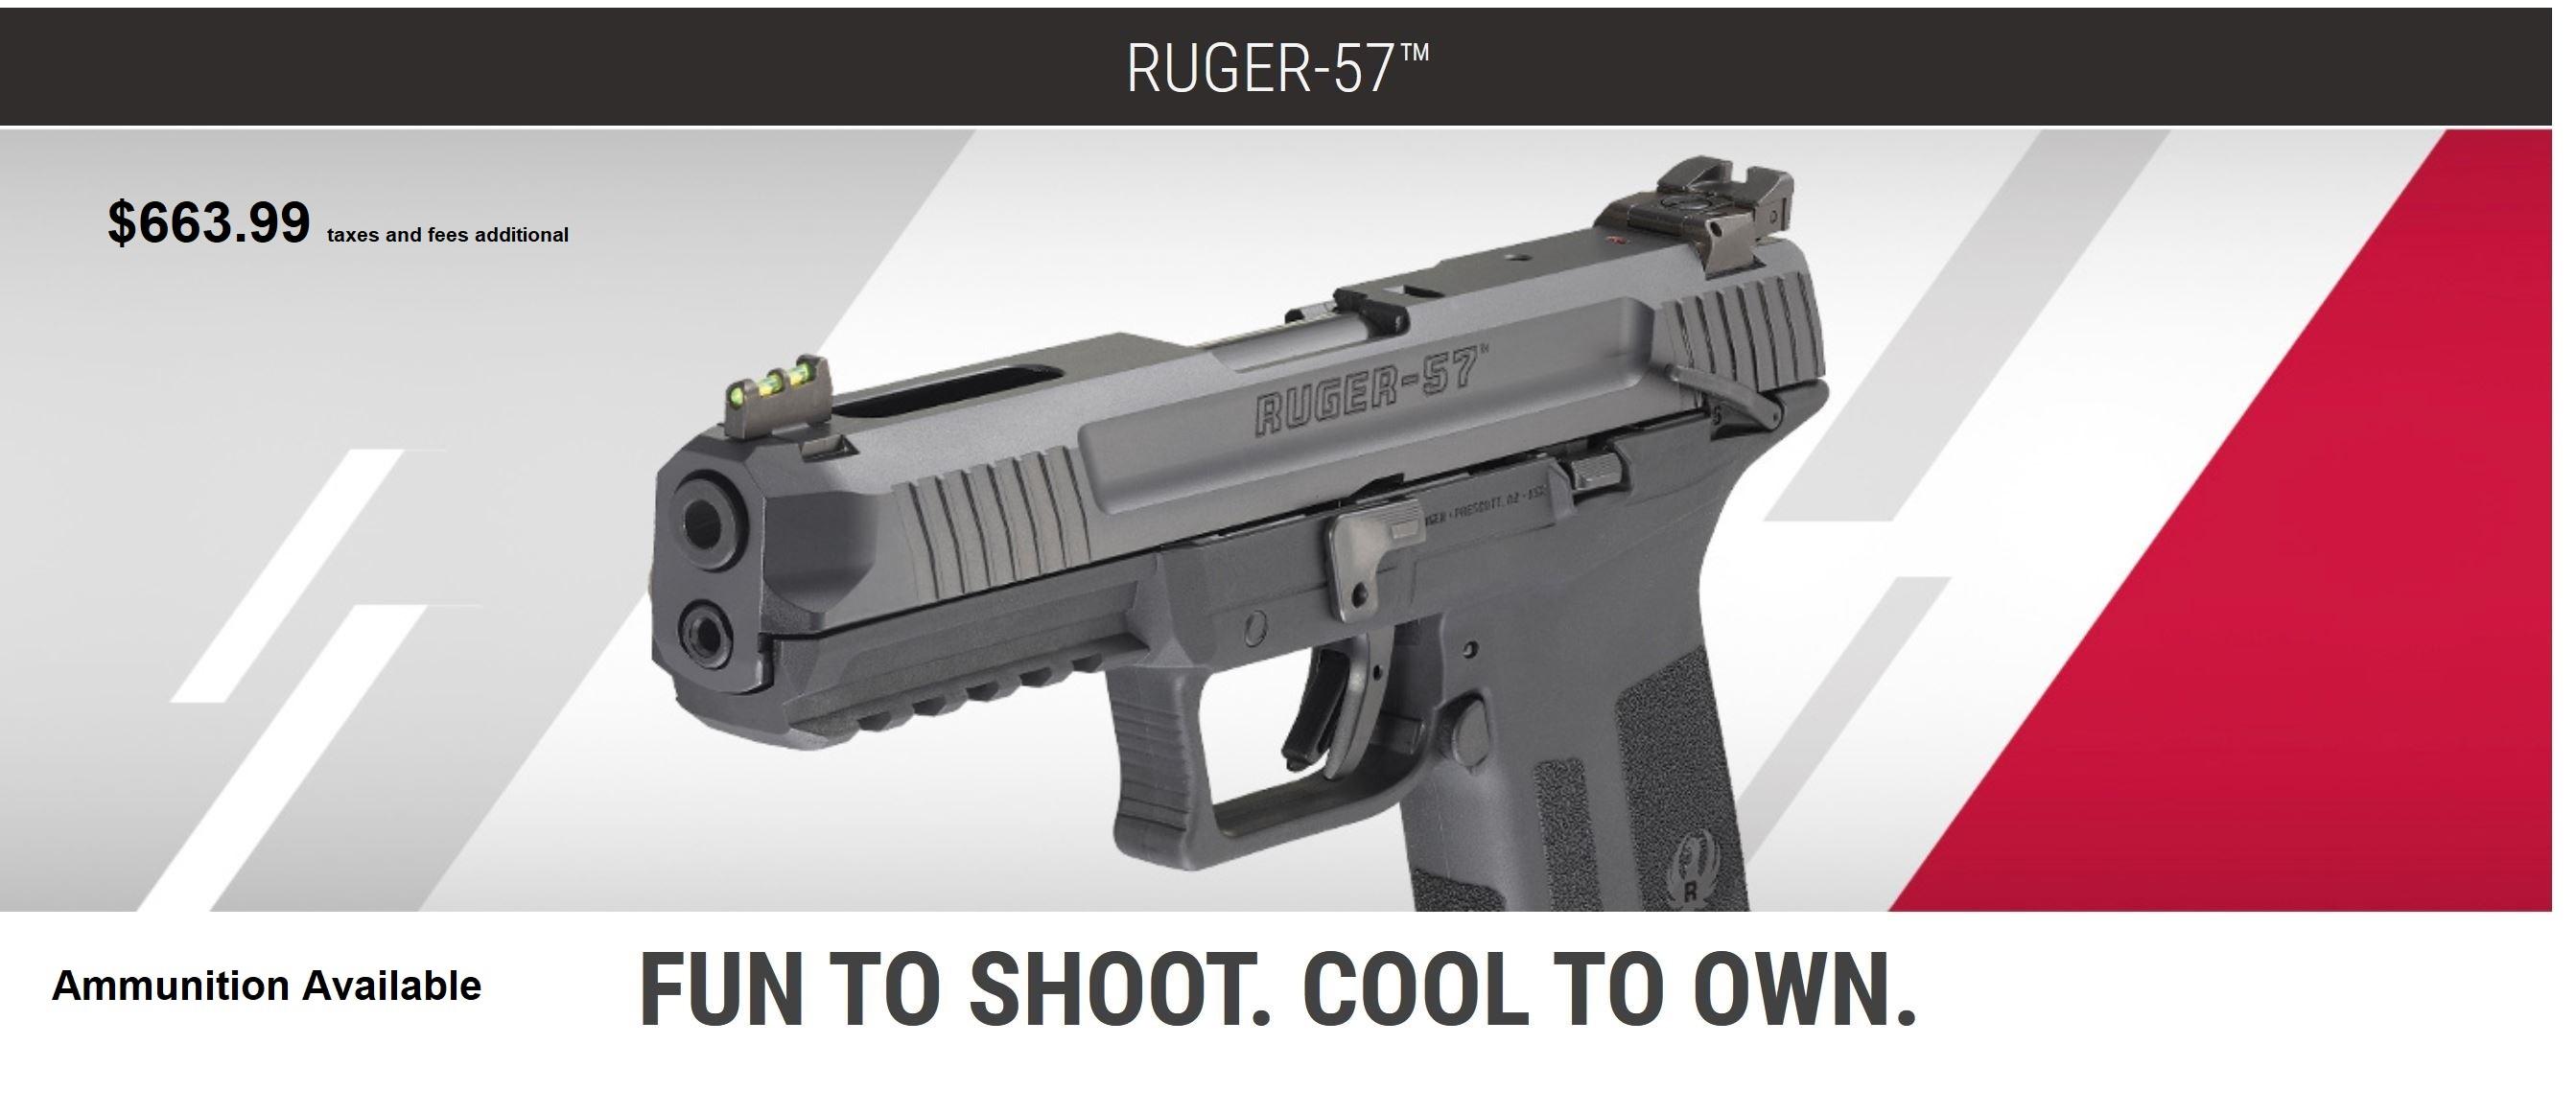 https://www.argunsammo.com/products/handguns-ruger-16401-736676164011-4106